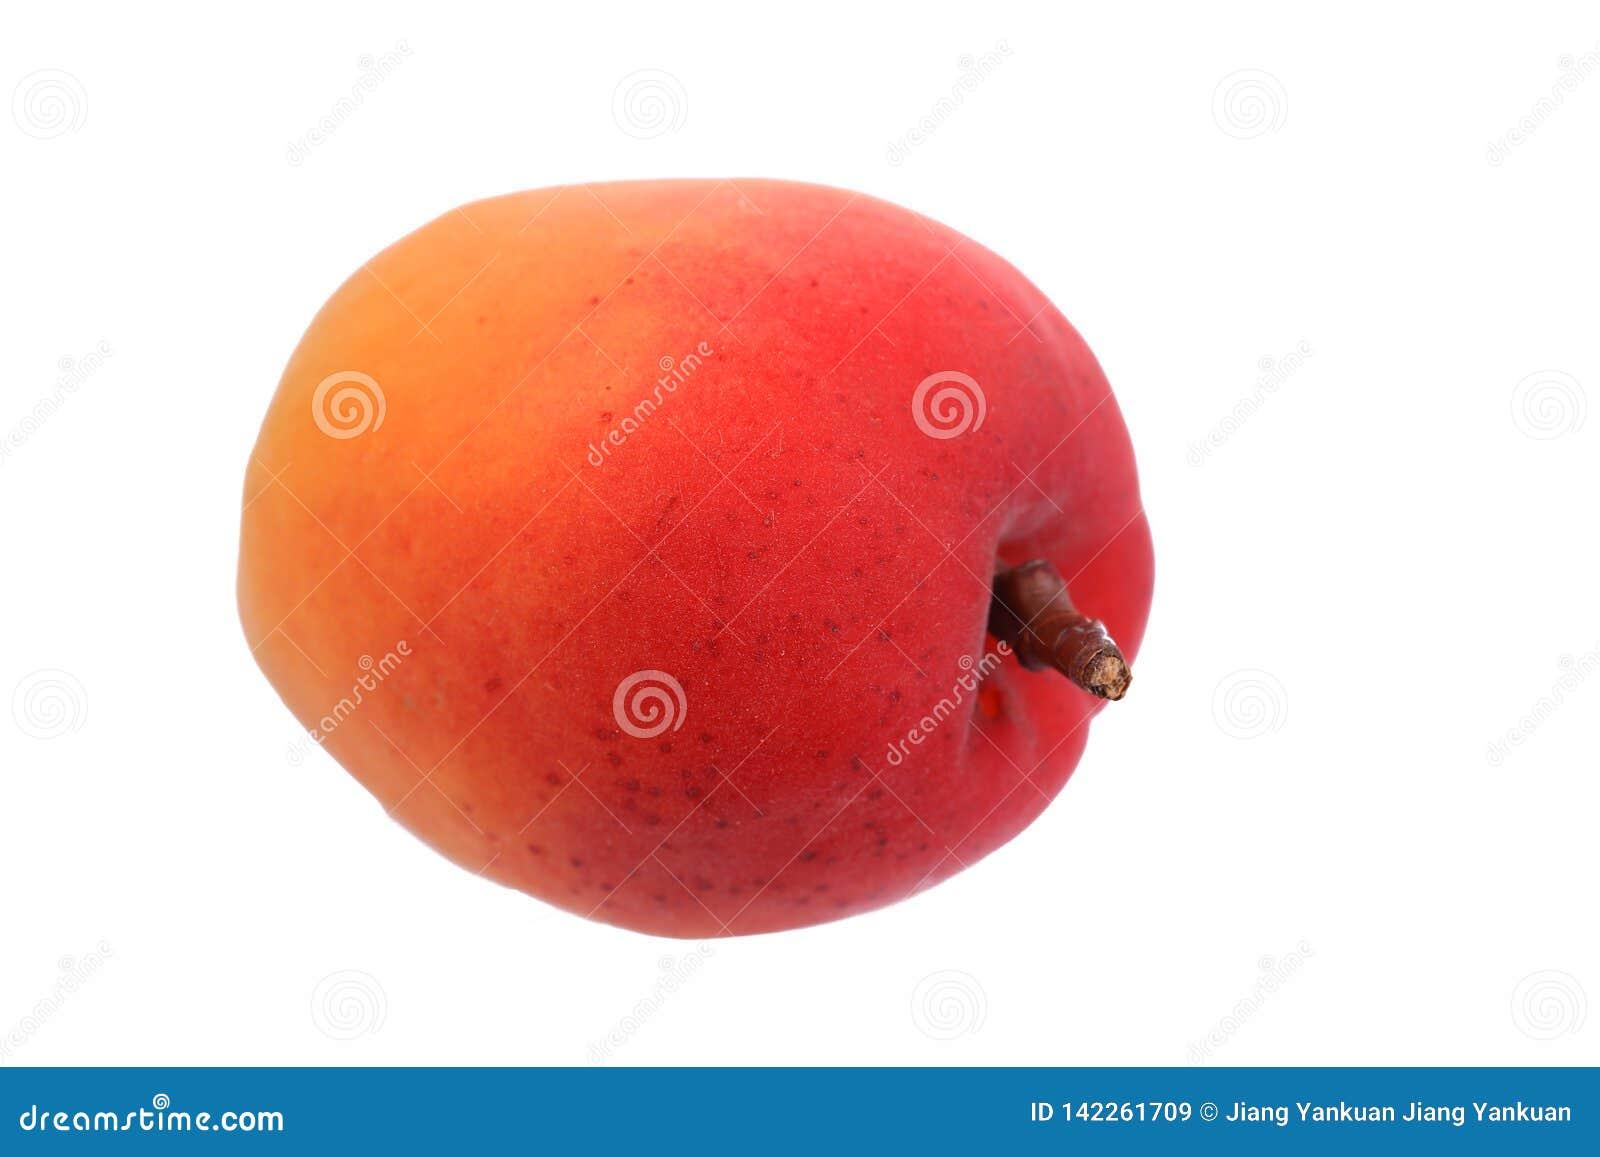 Ripe red apricot